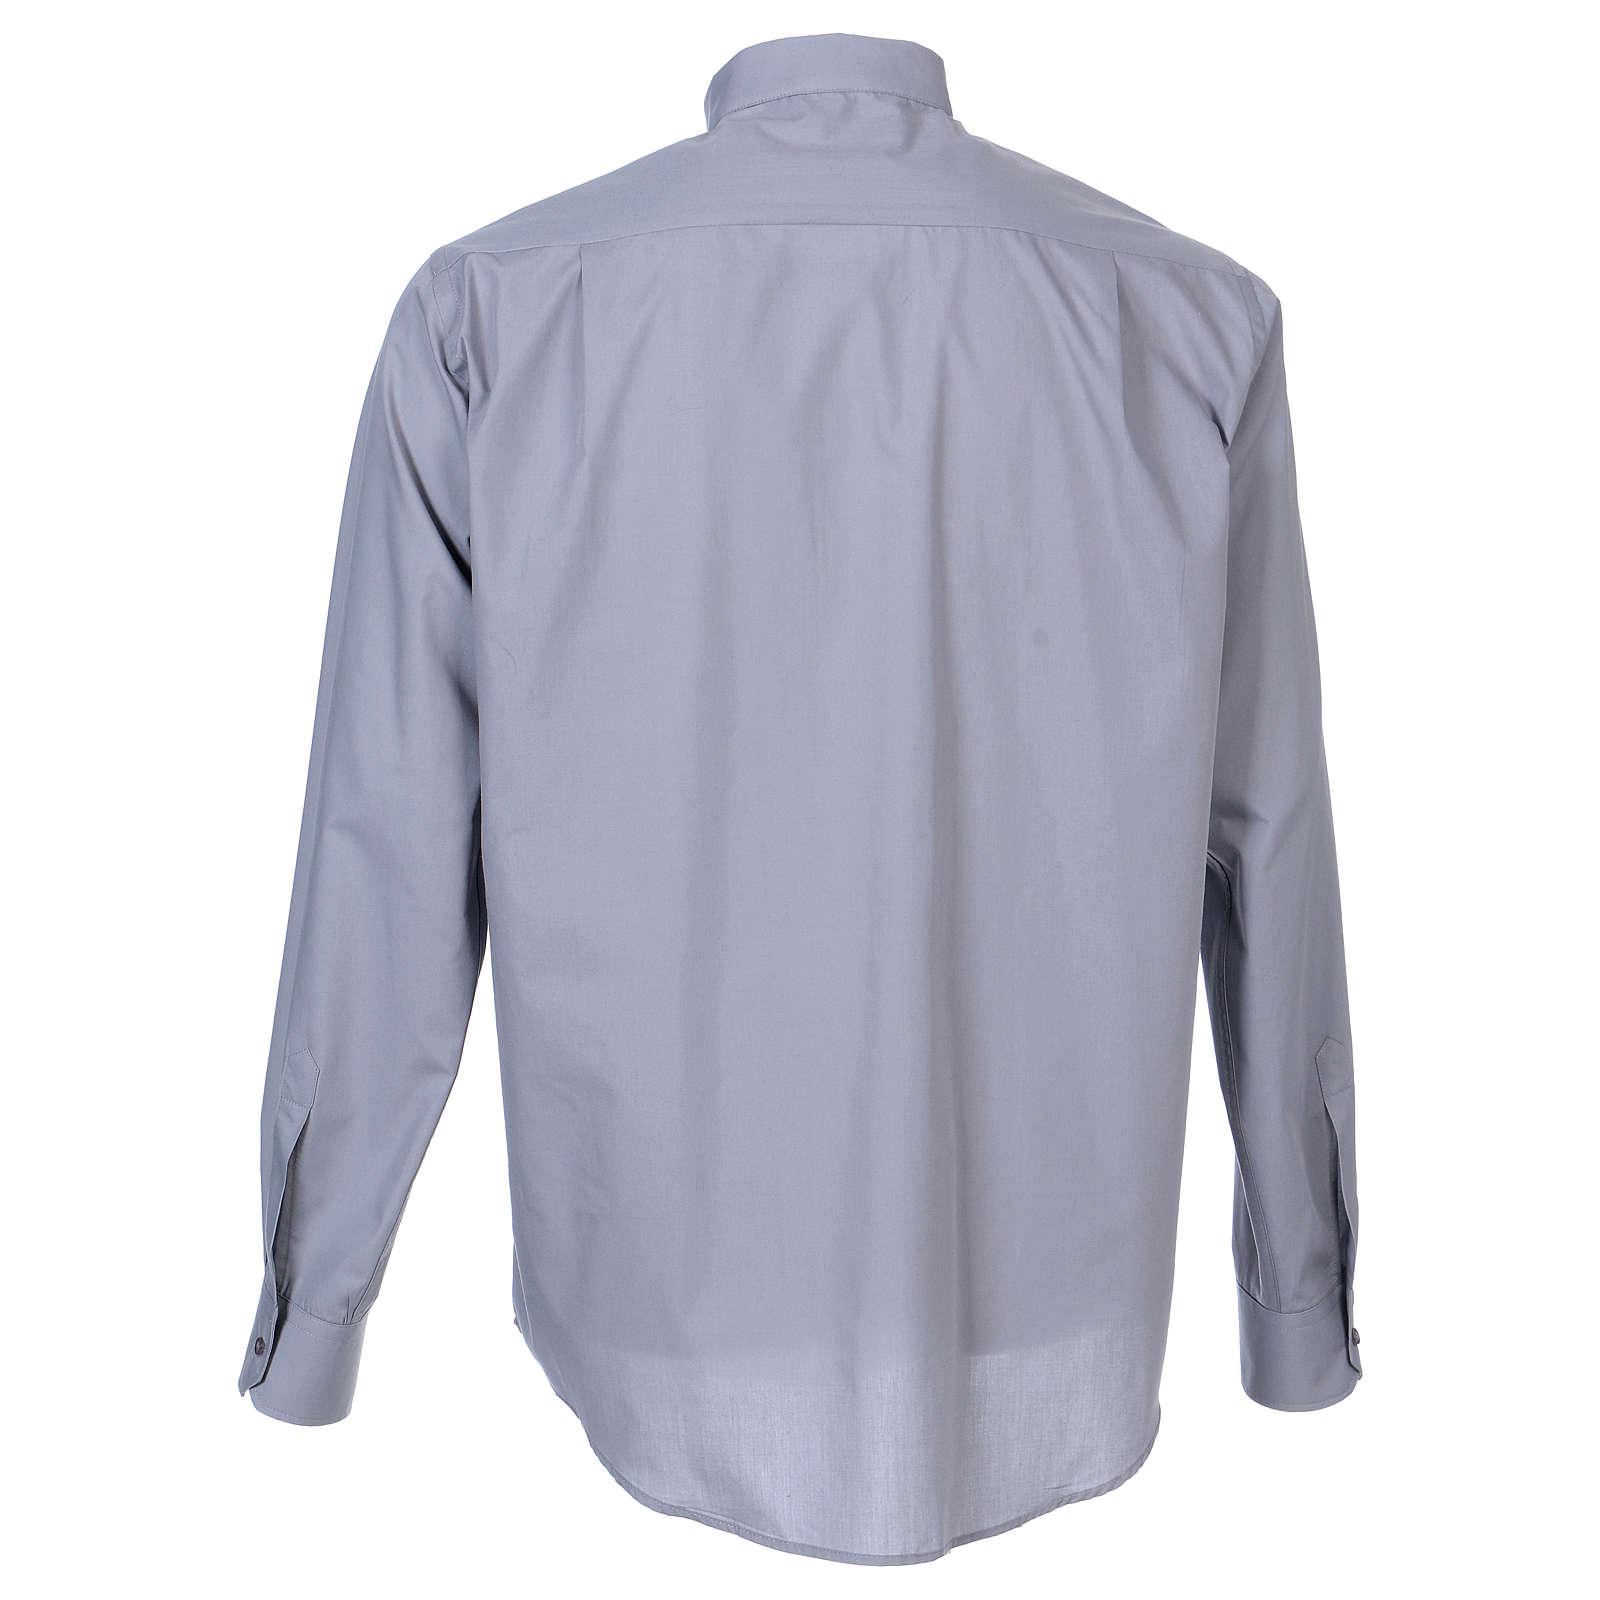 Chemise Clergy longues manches tissu mixte coton gris clair In Primis 4